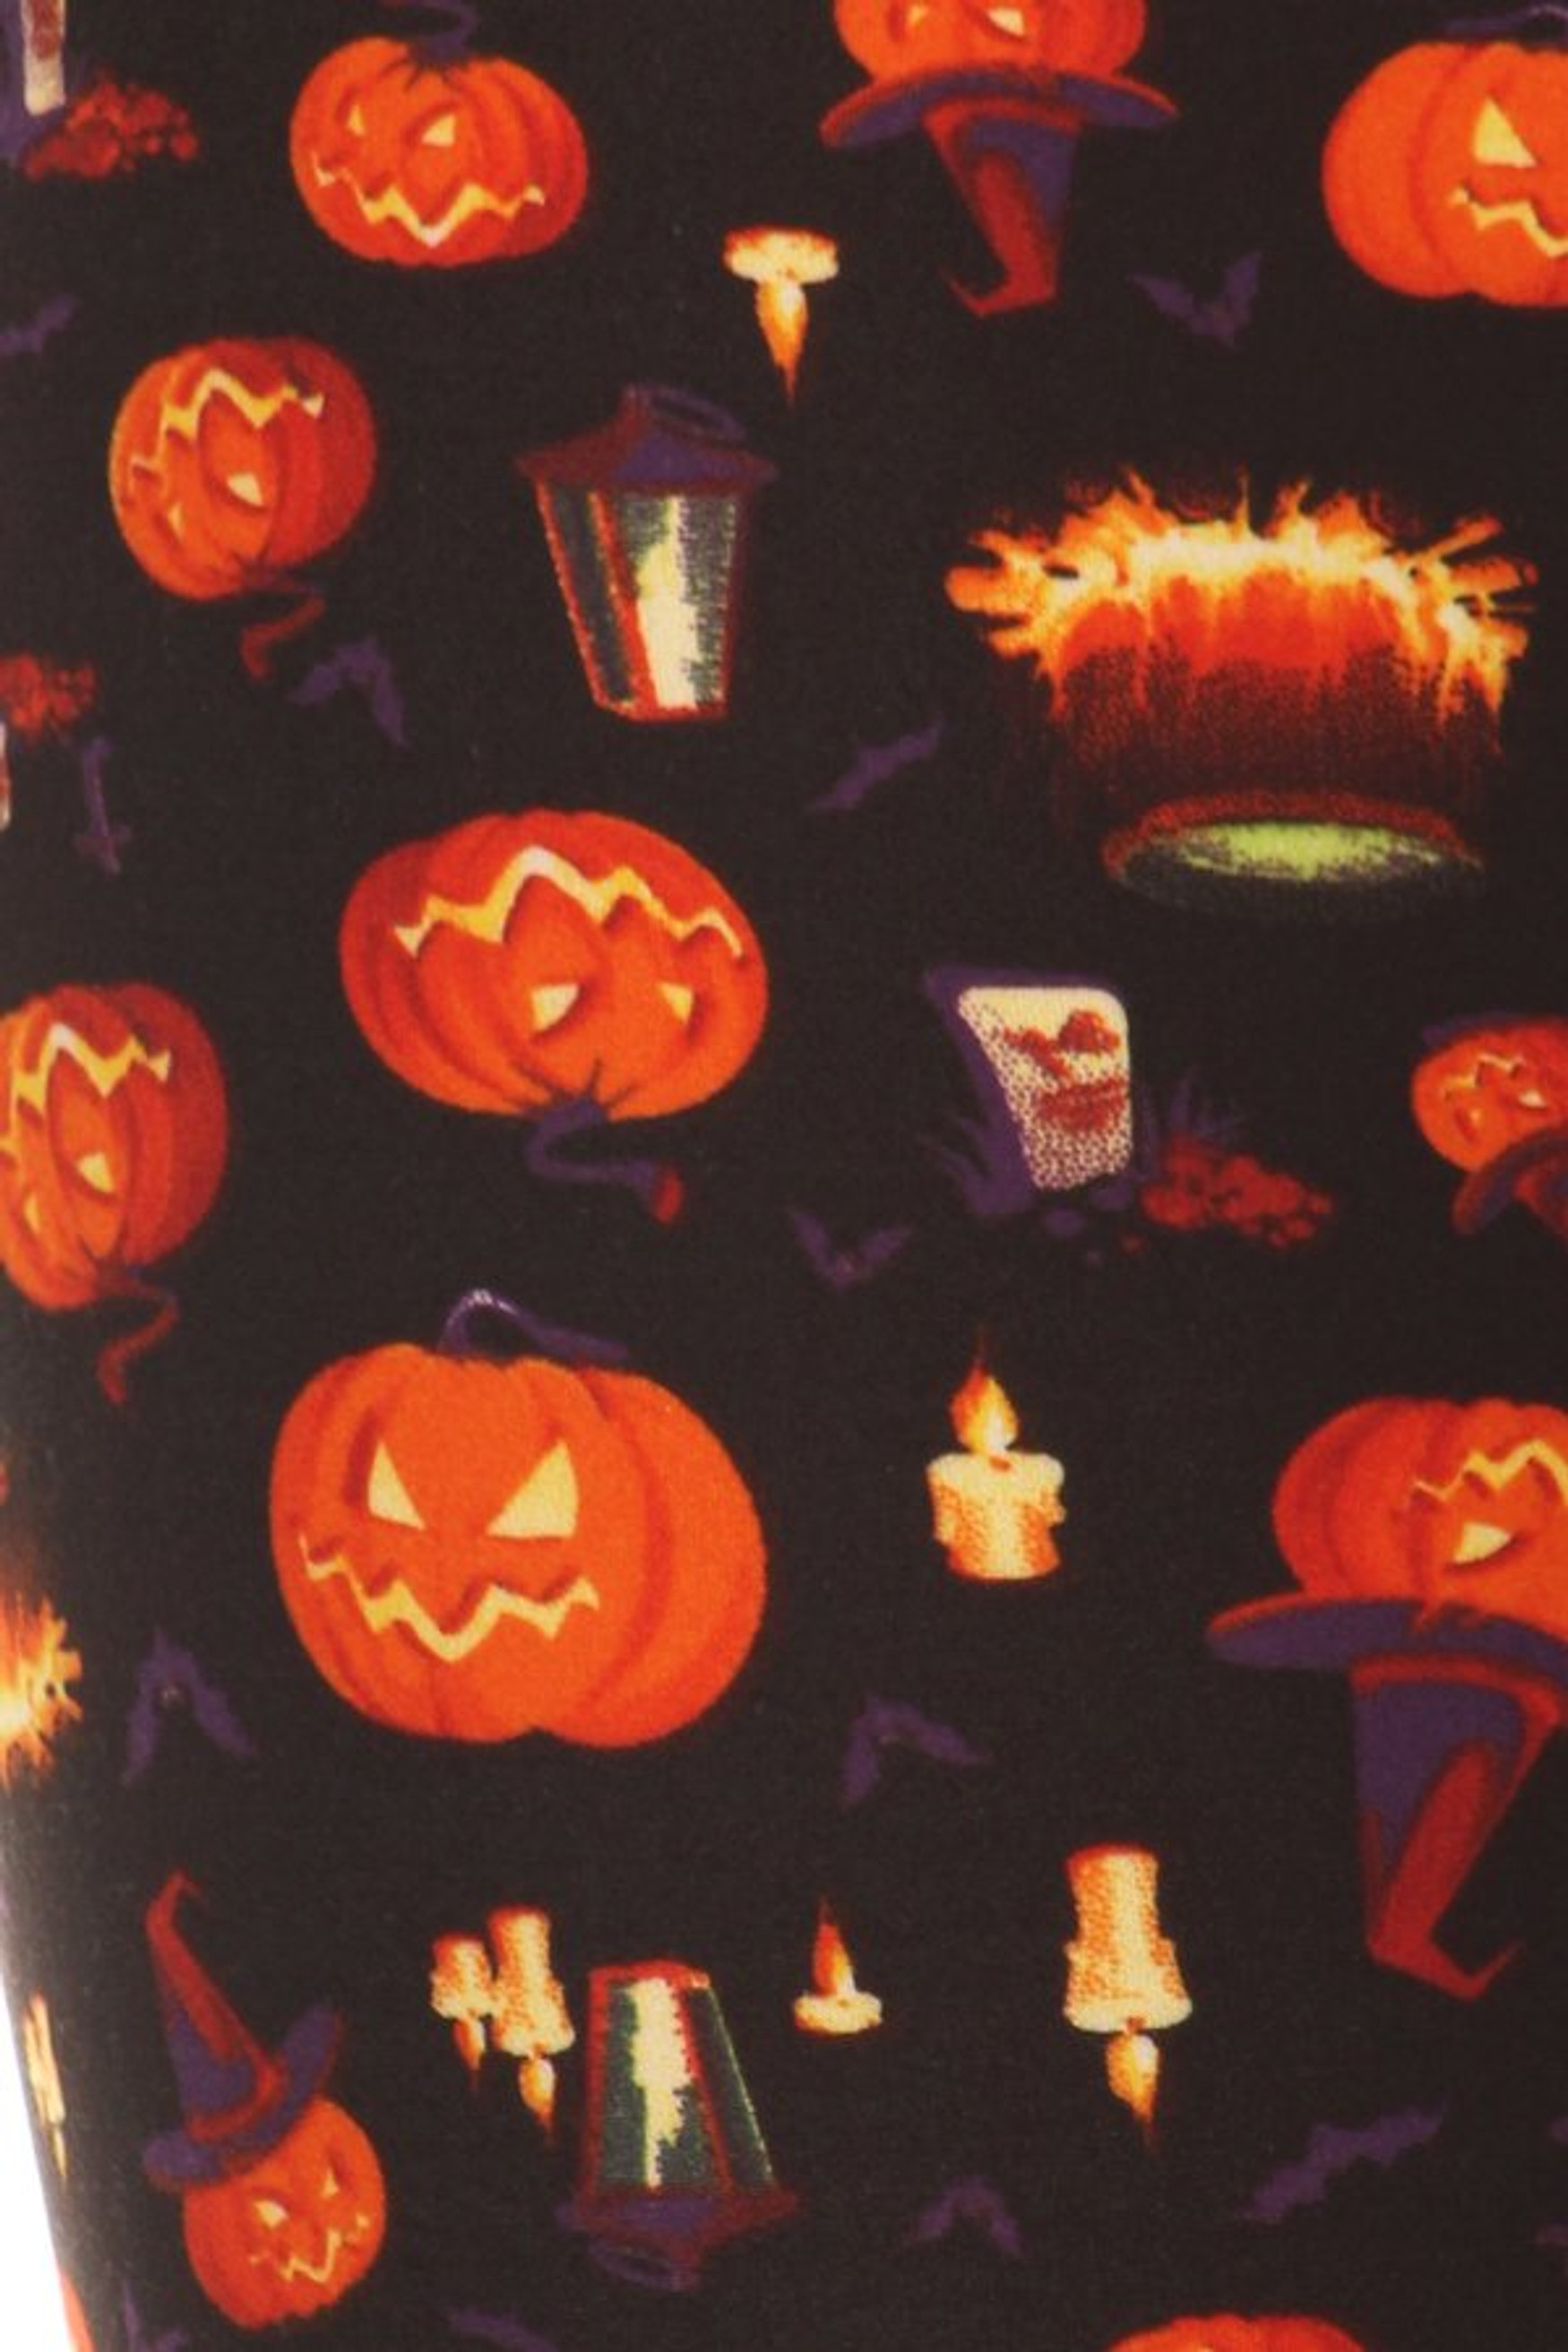 Brushed Pumpkins Cauldrons and Candles Halloween Leggings